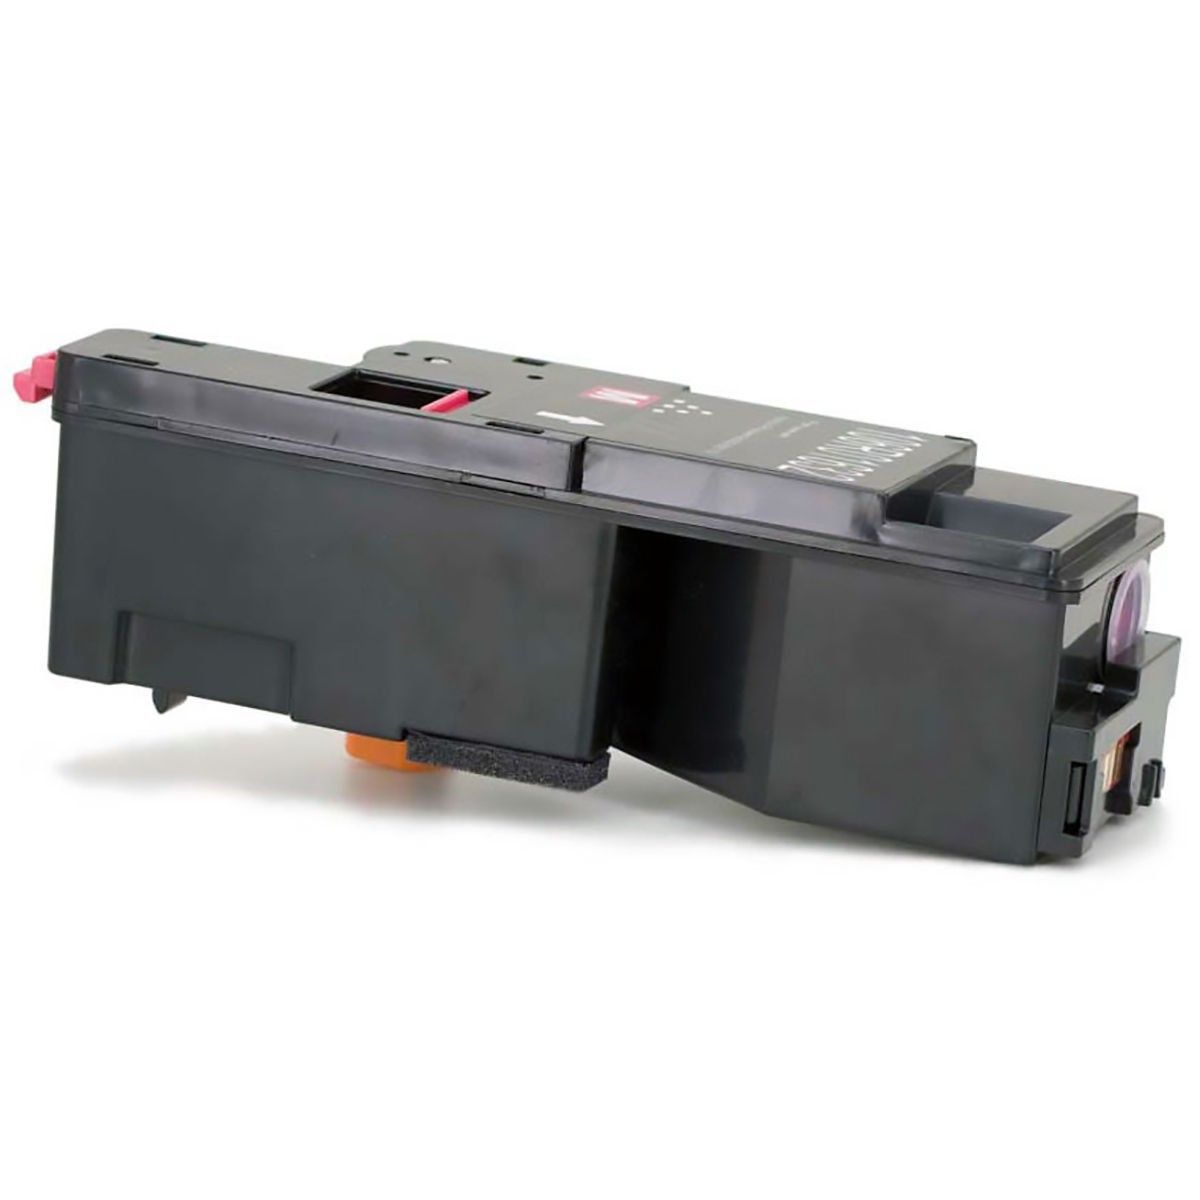 Compatível: Toner 106R01632 para Impressora Xerox WorkCentre 6015 6015b 6015ni Phaser 6000 6010 / Magenta / 1.000